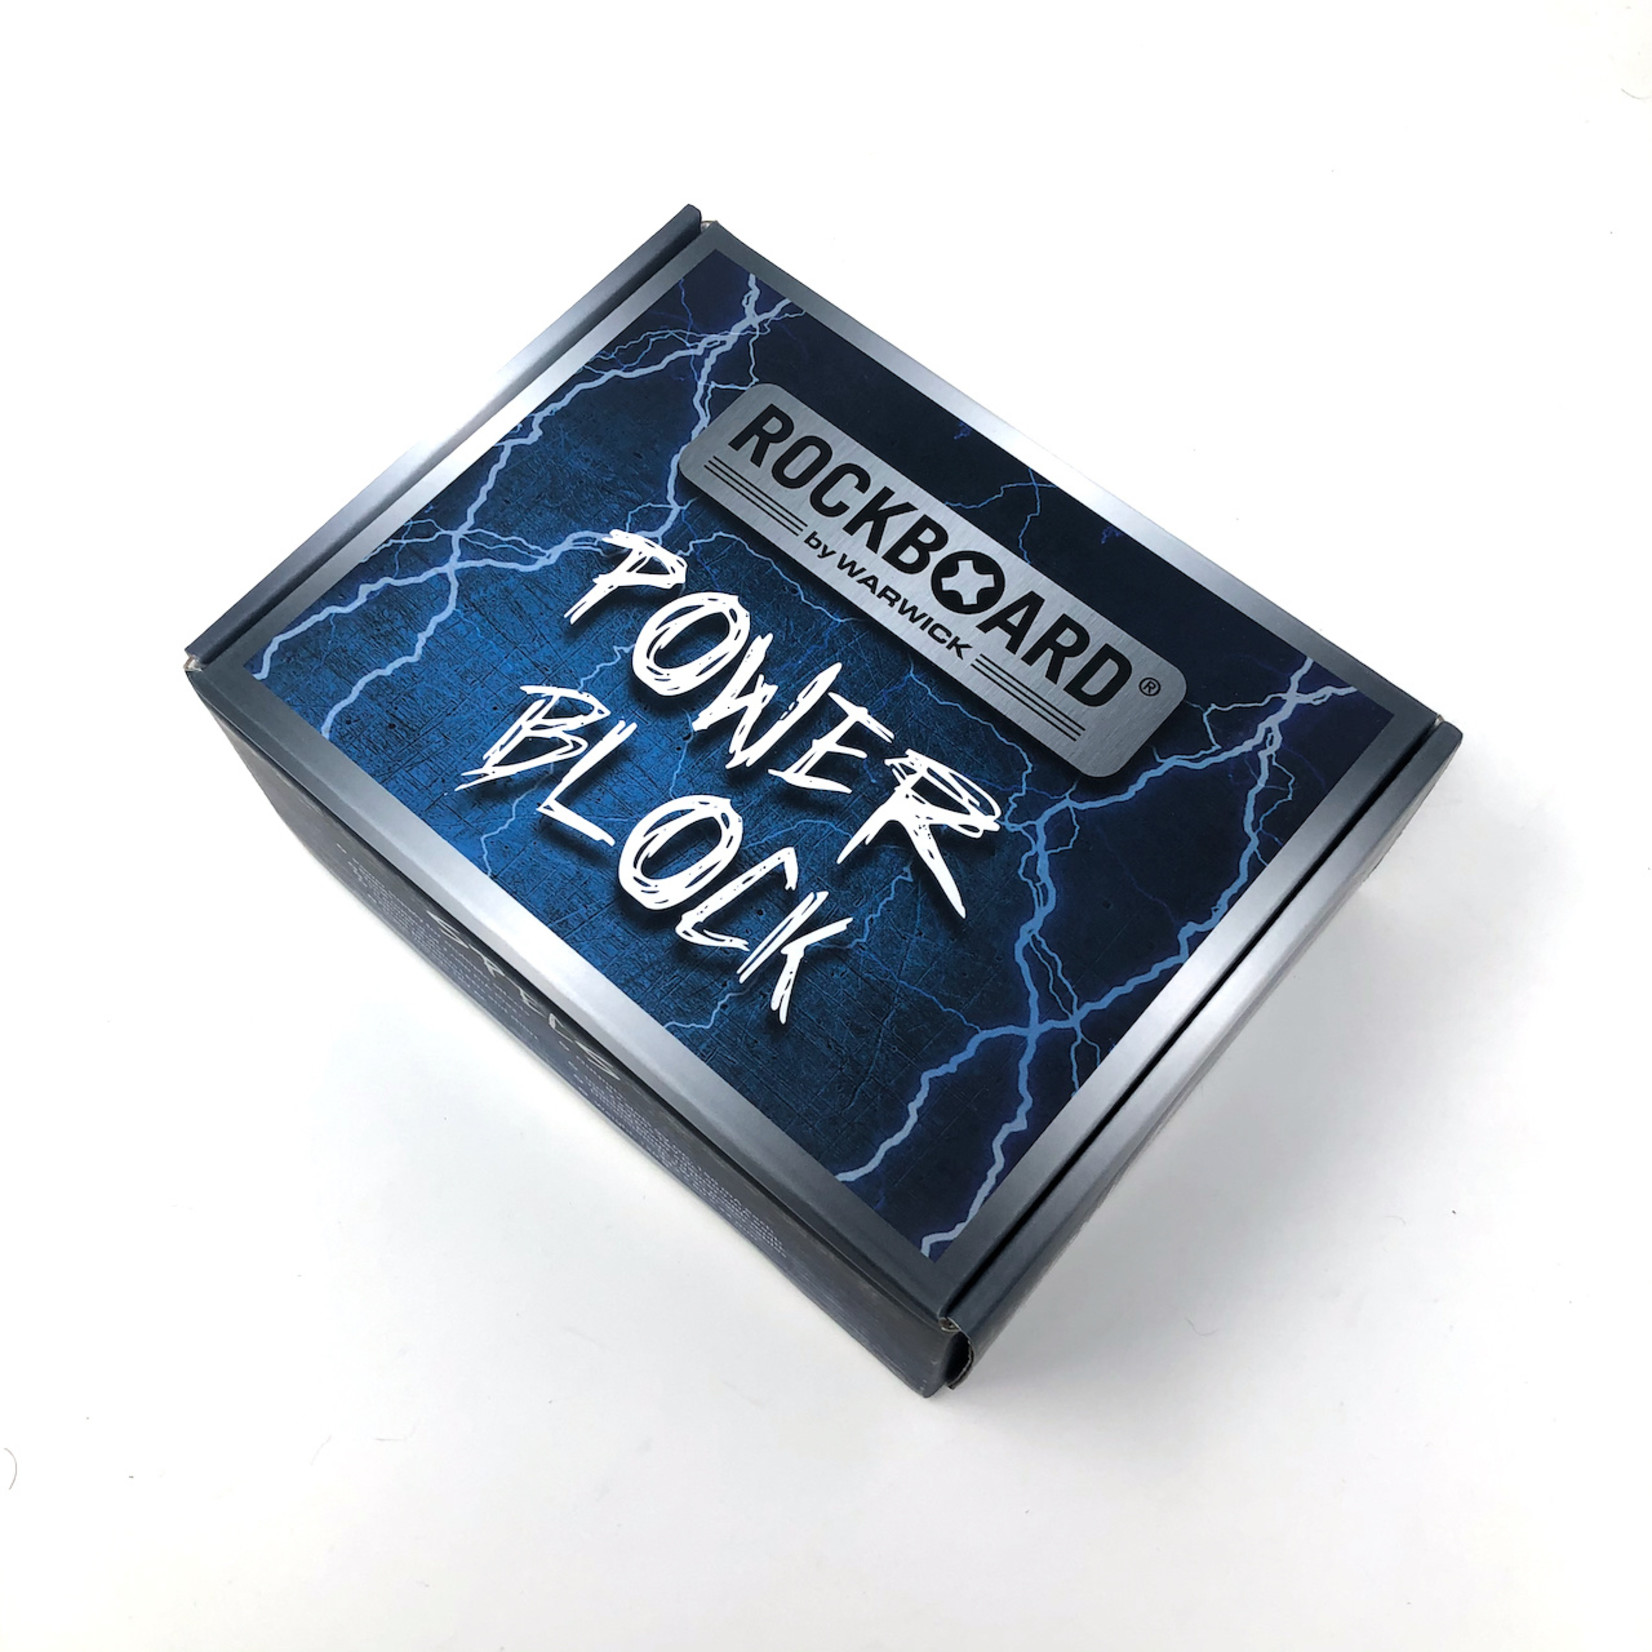 Rockboard RockBoard Power Block power supply for multiple effects pedals (8x 9v 150mA   2x 18v 400 mA)